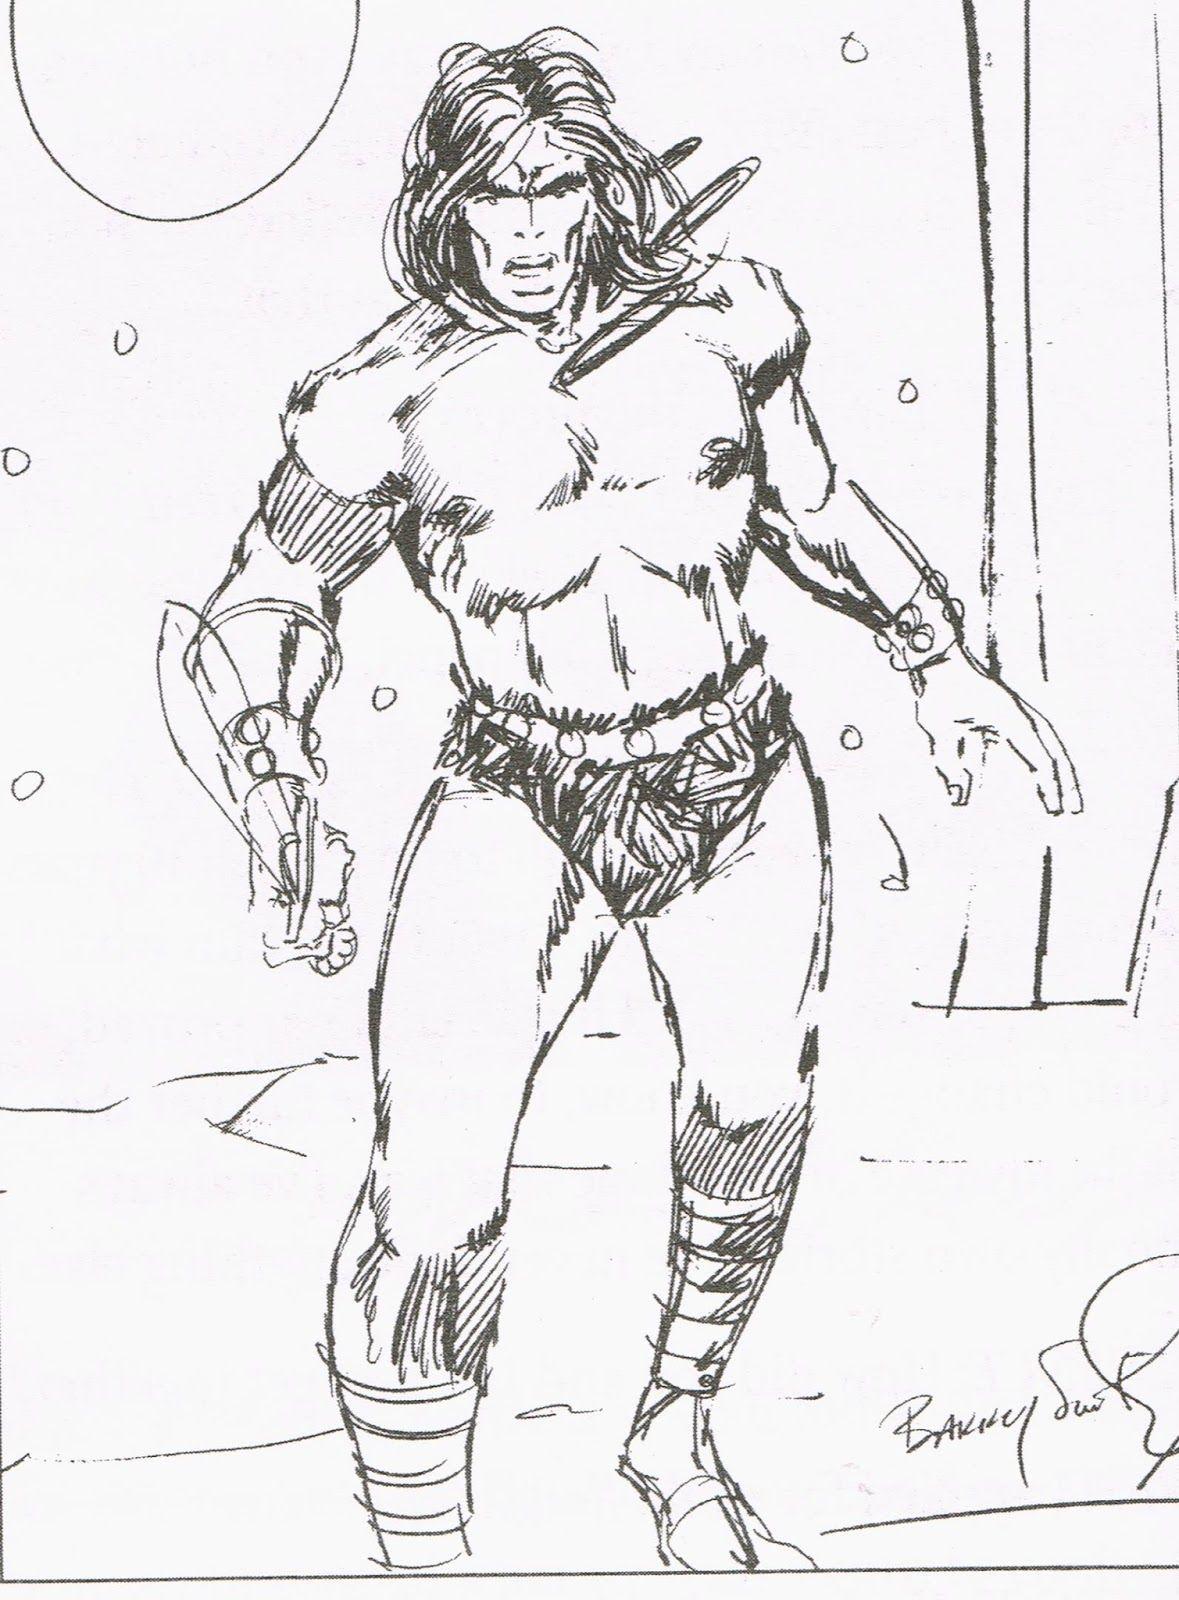 Cap'n's Comics: A Conan Sketch by Barry Smith